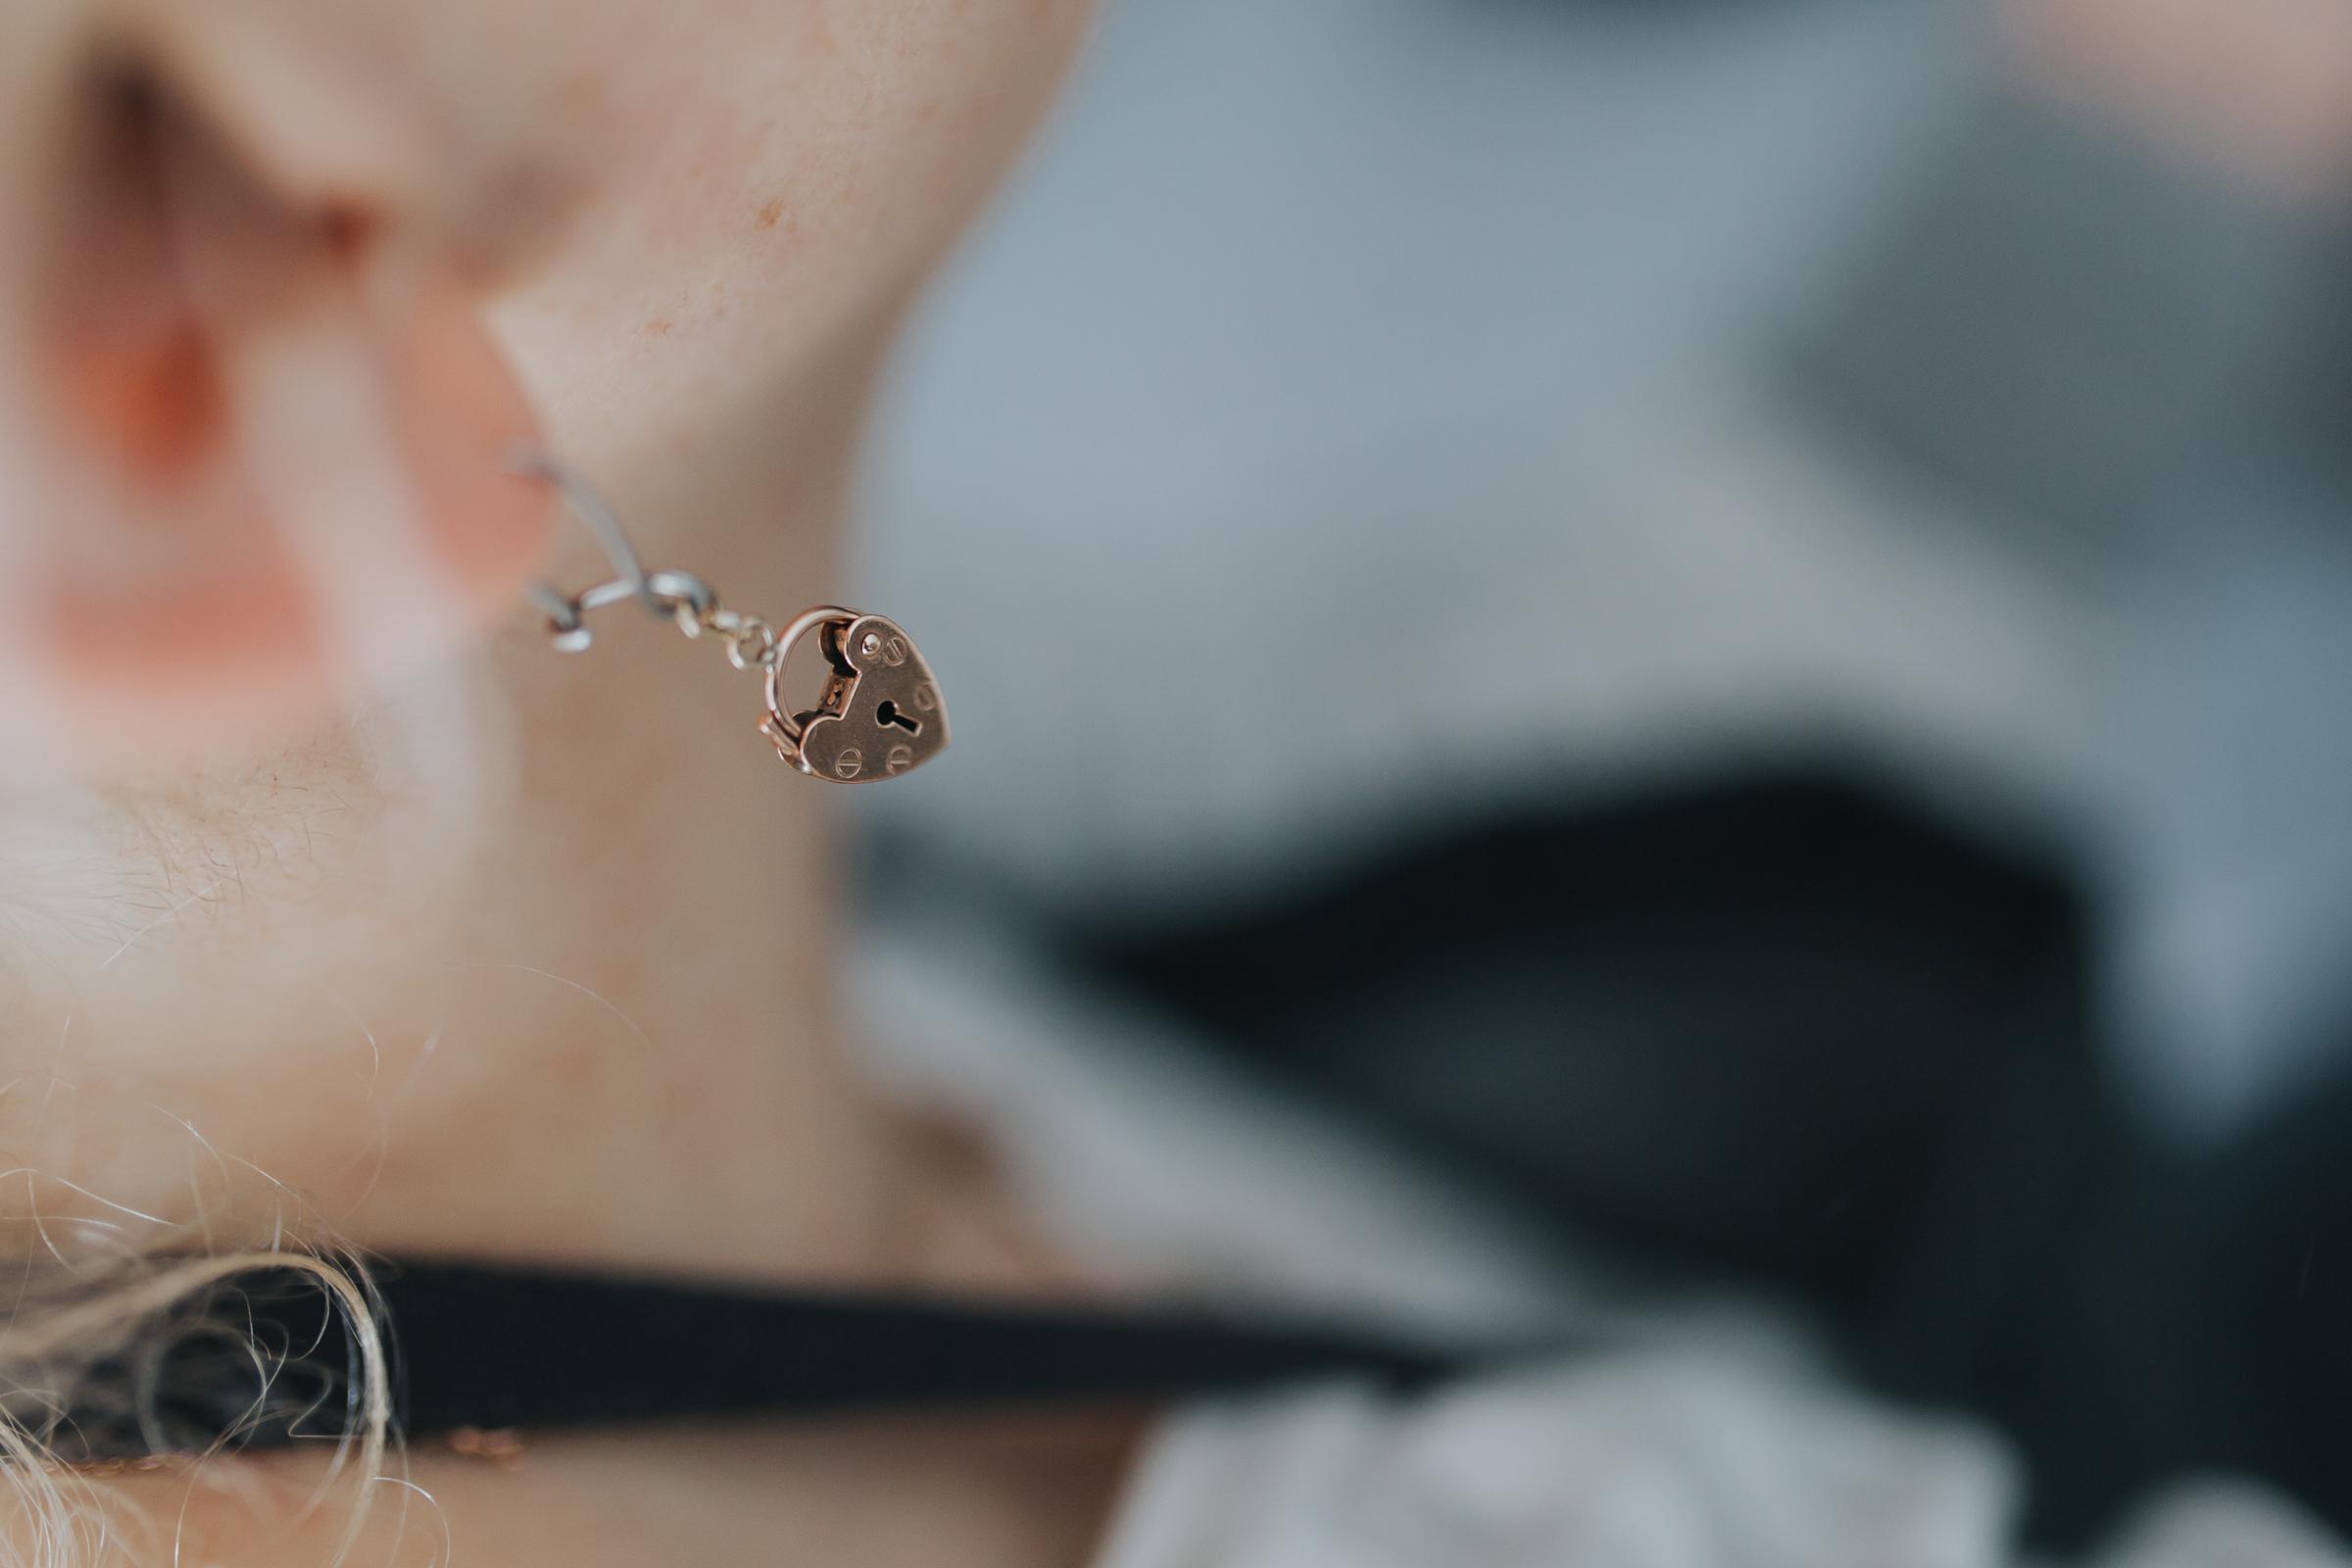 interview-jo-tootsievalentine-fine-designer-jewellery-fair-trade-gold-minas-planet-jasmina-haskovic-london-uk22.jpg